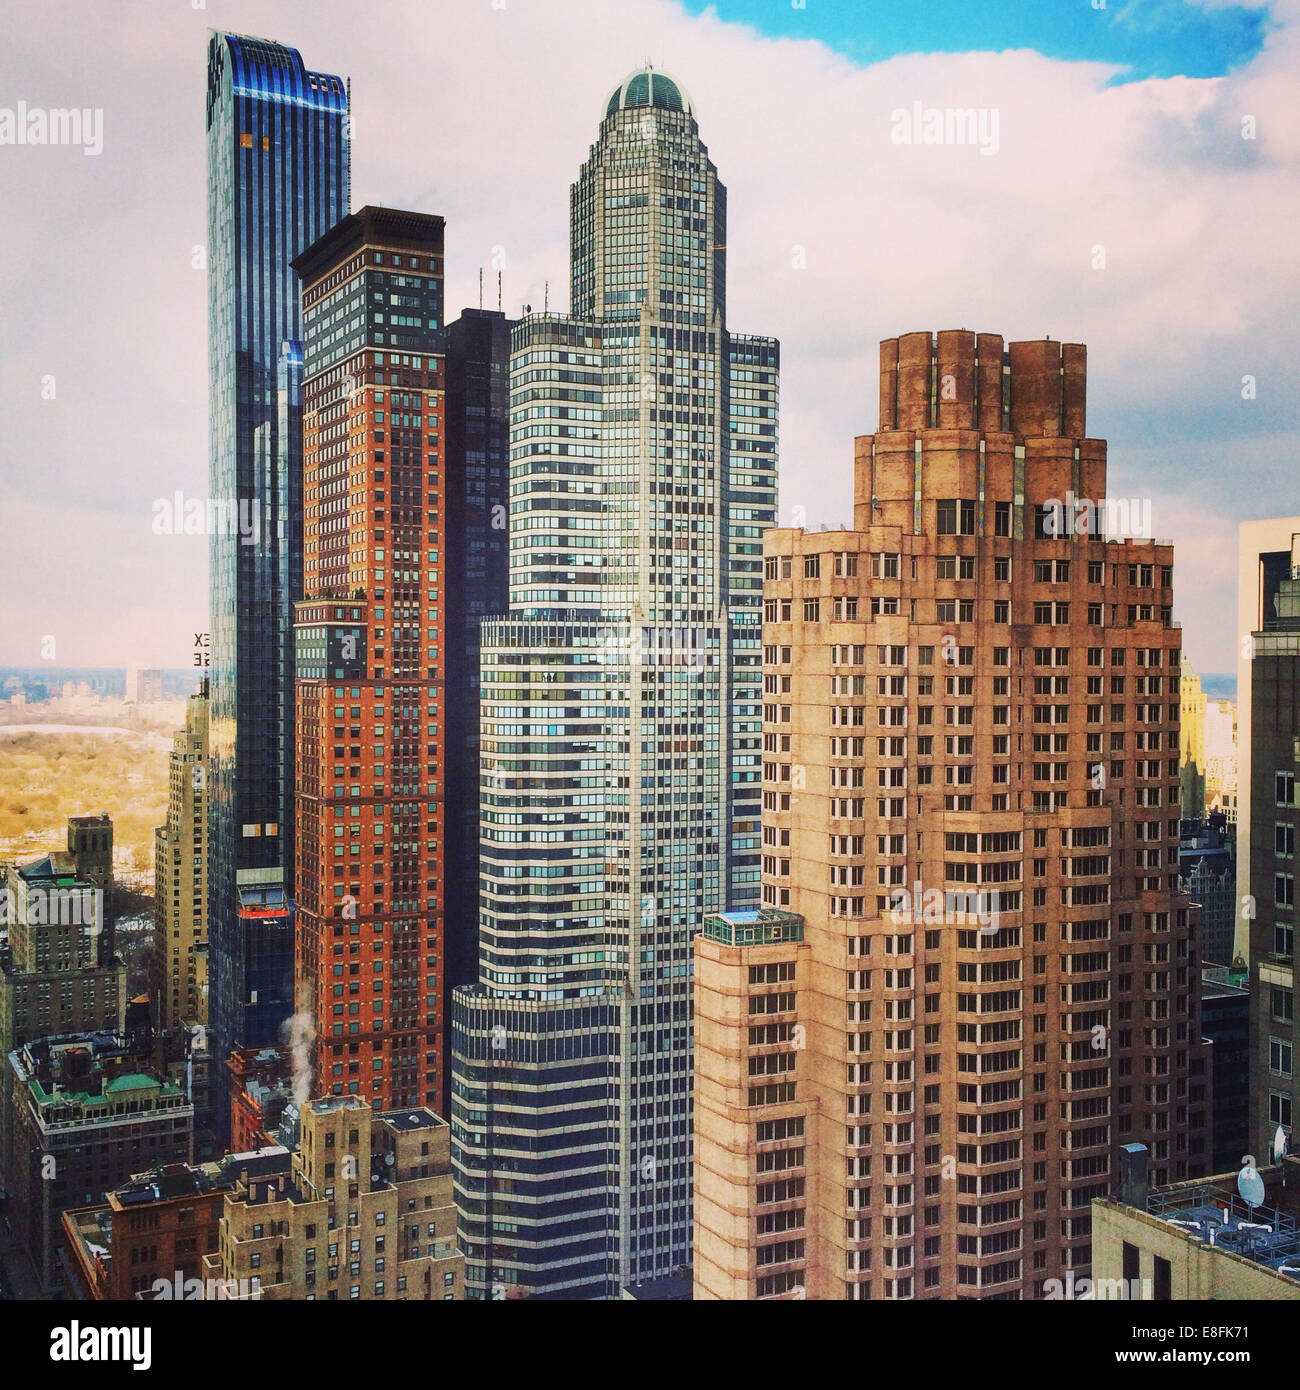 USA, New York State, New York City Midtown Manhattan skyline Stockbild